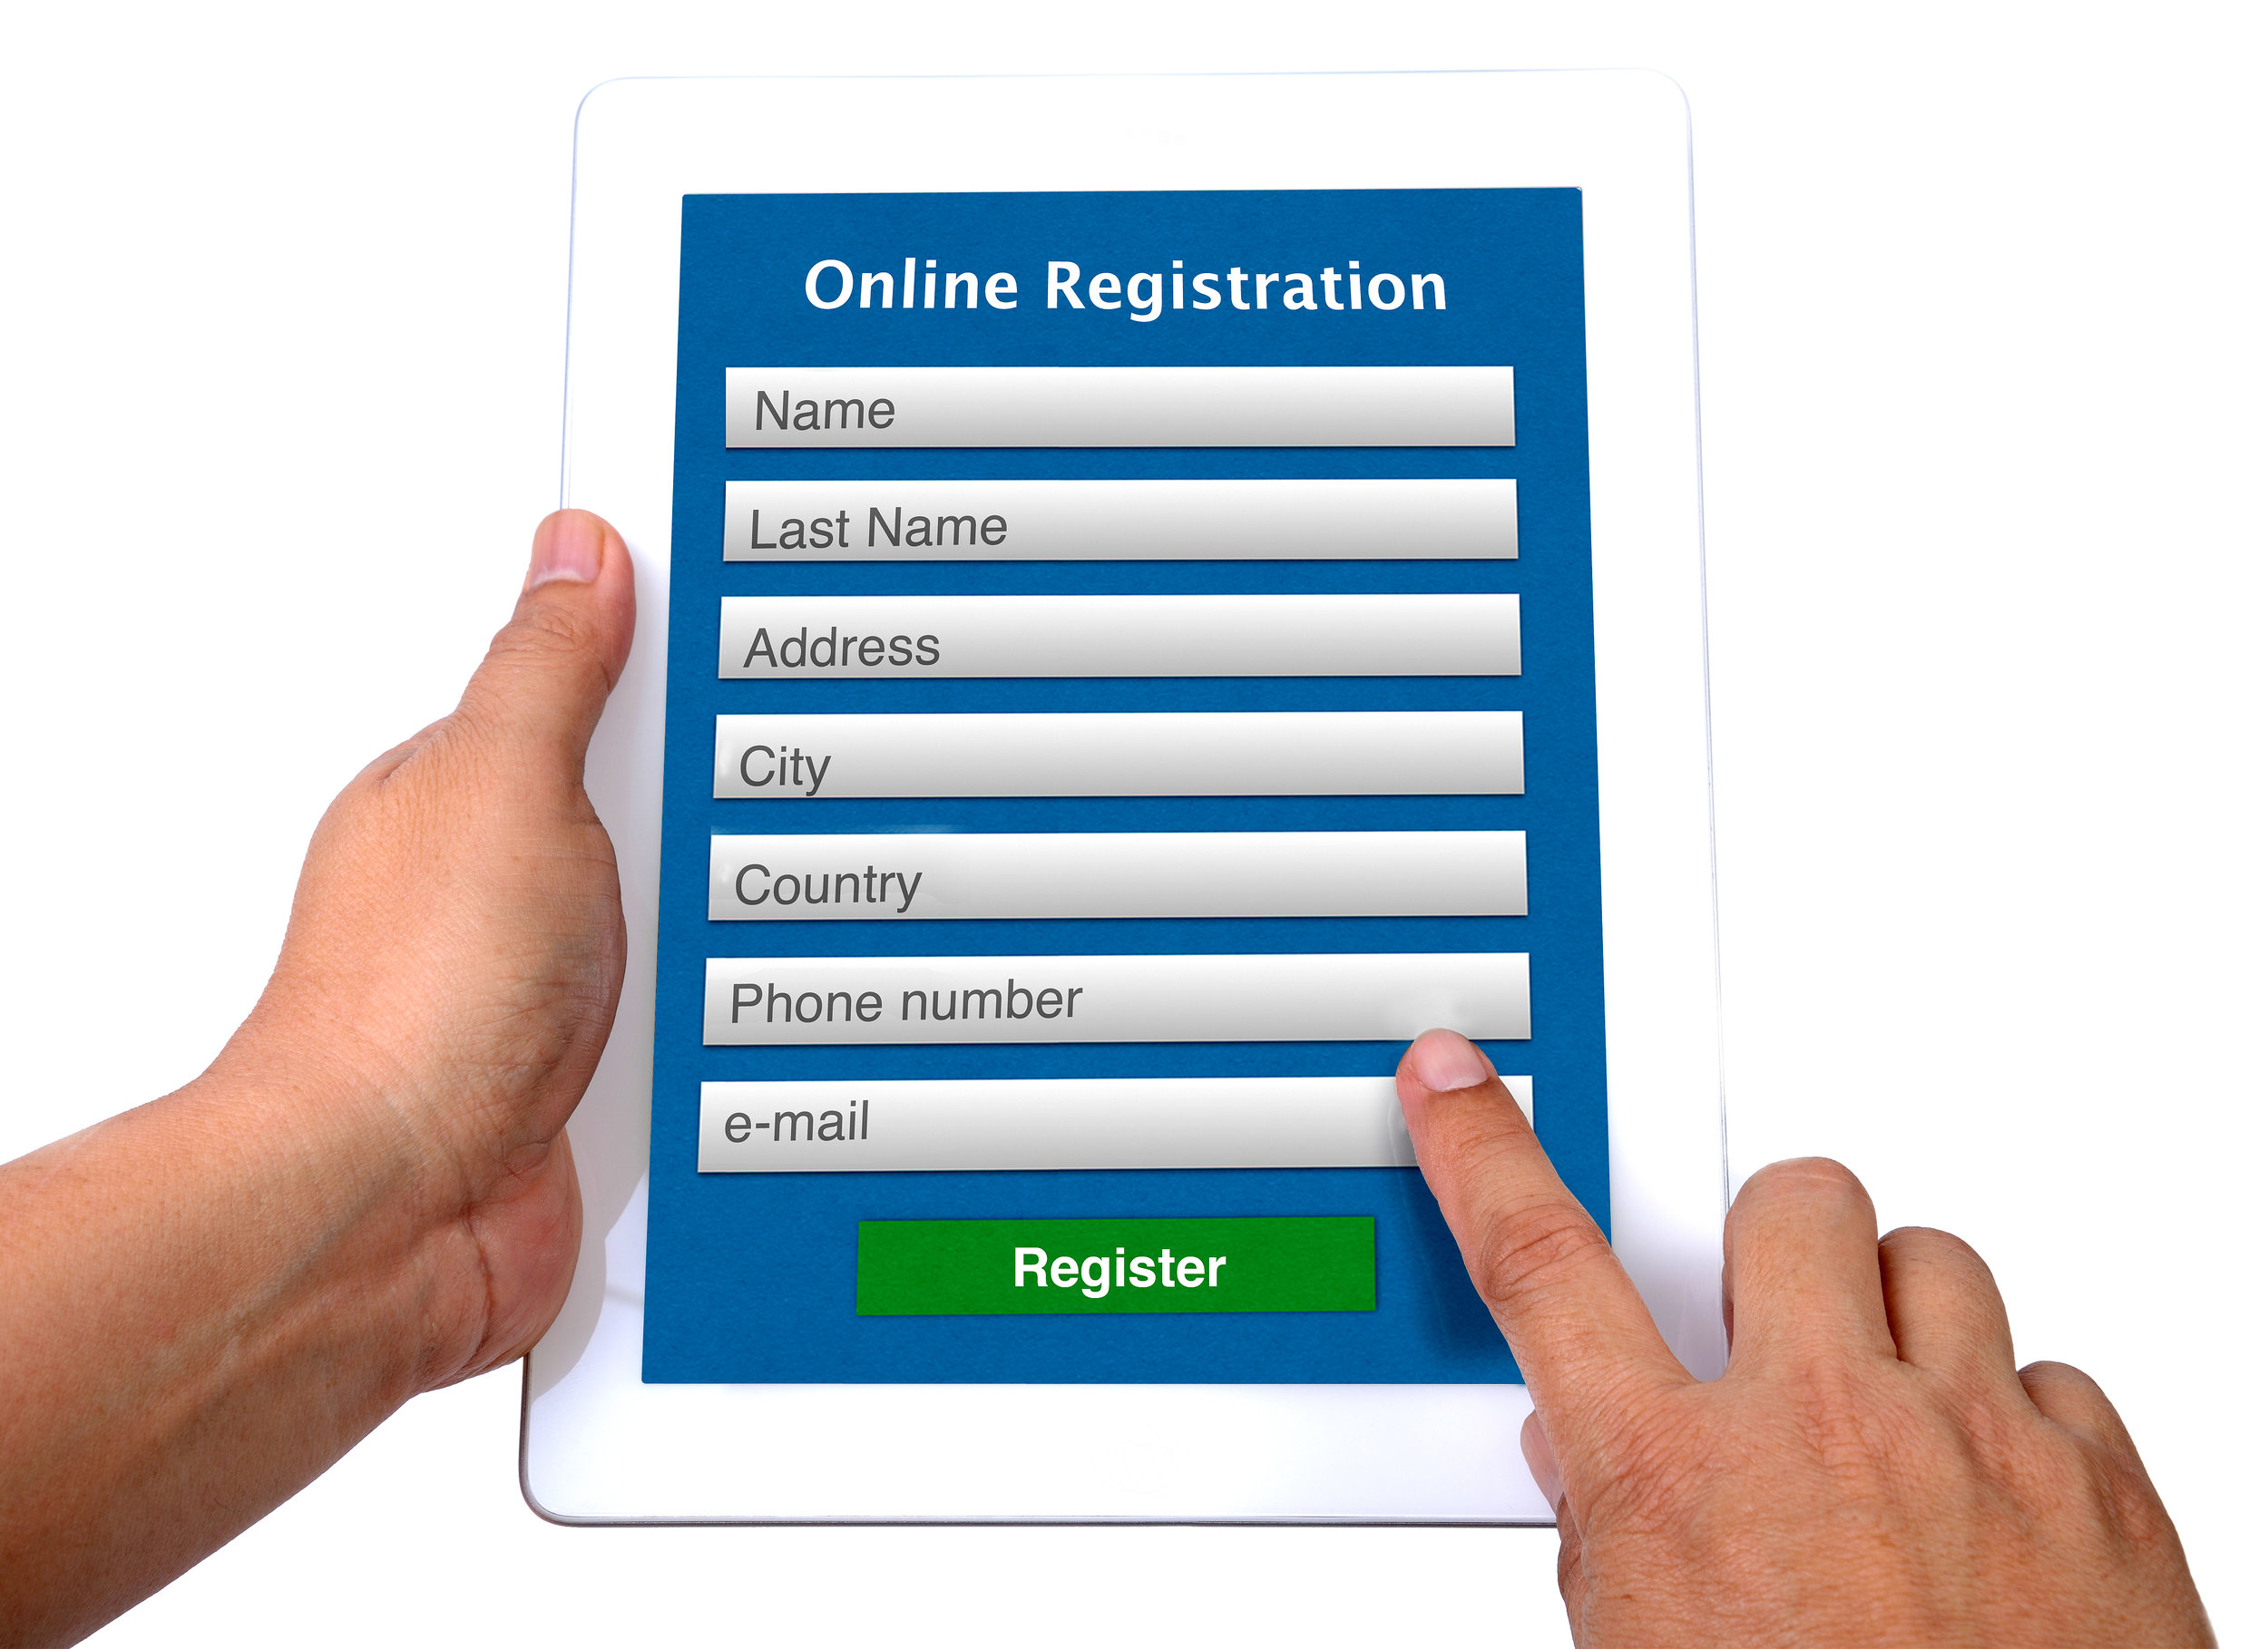 Online-registeration-form.-485851421_4400x3200.jpeg